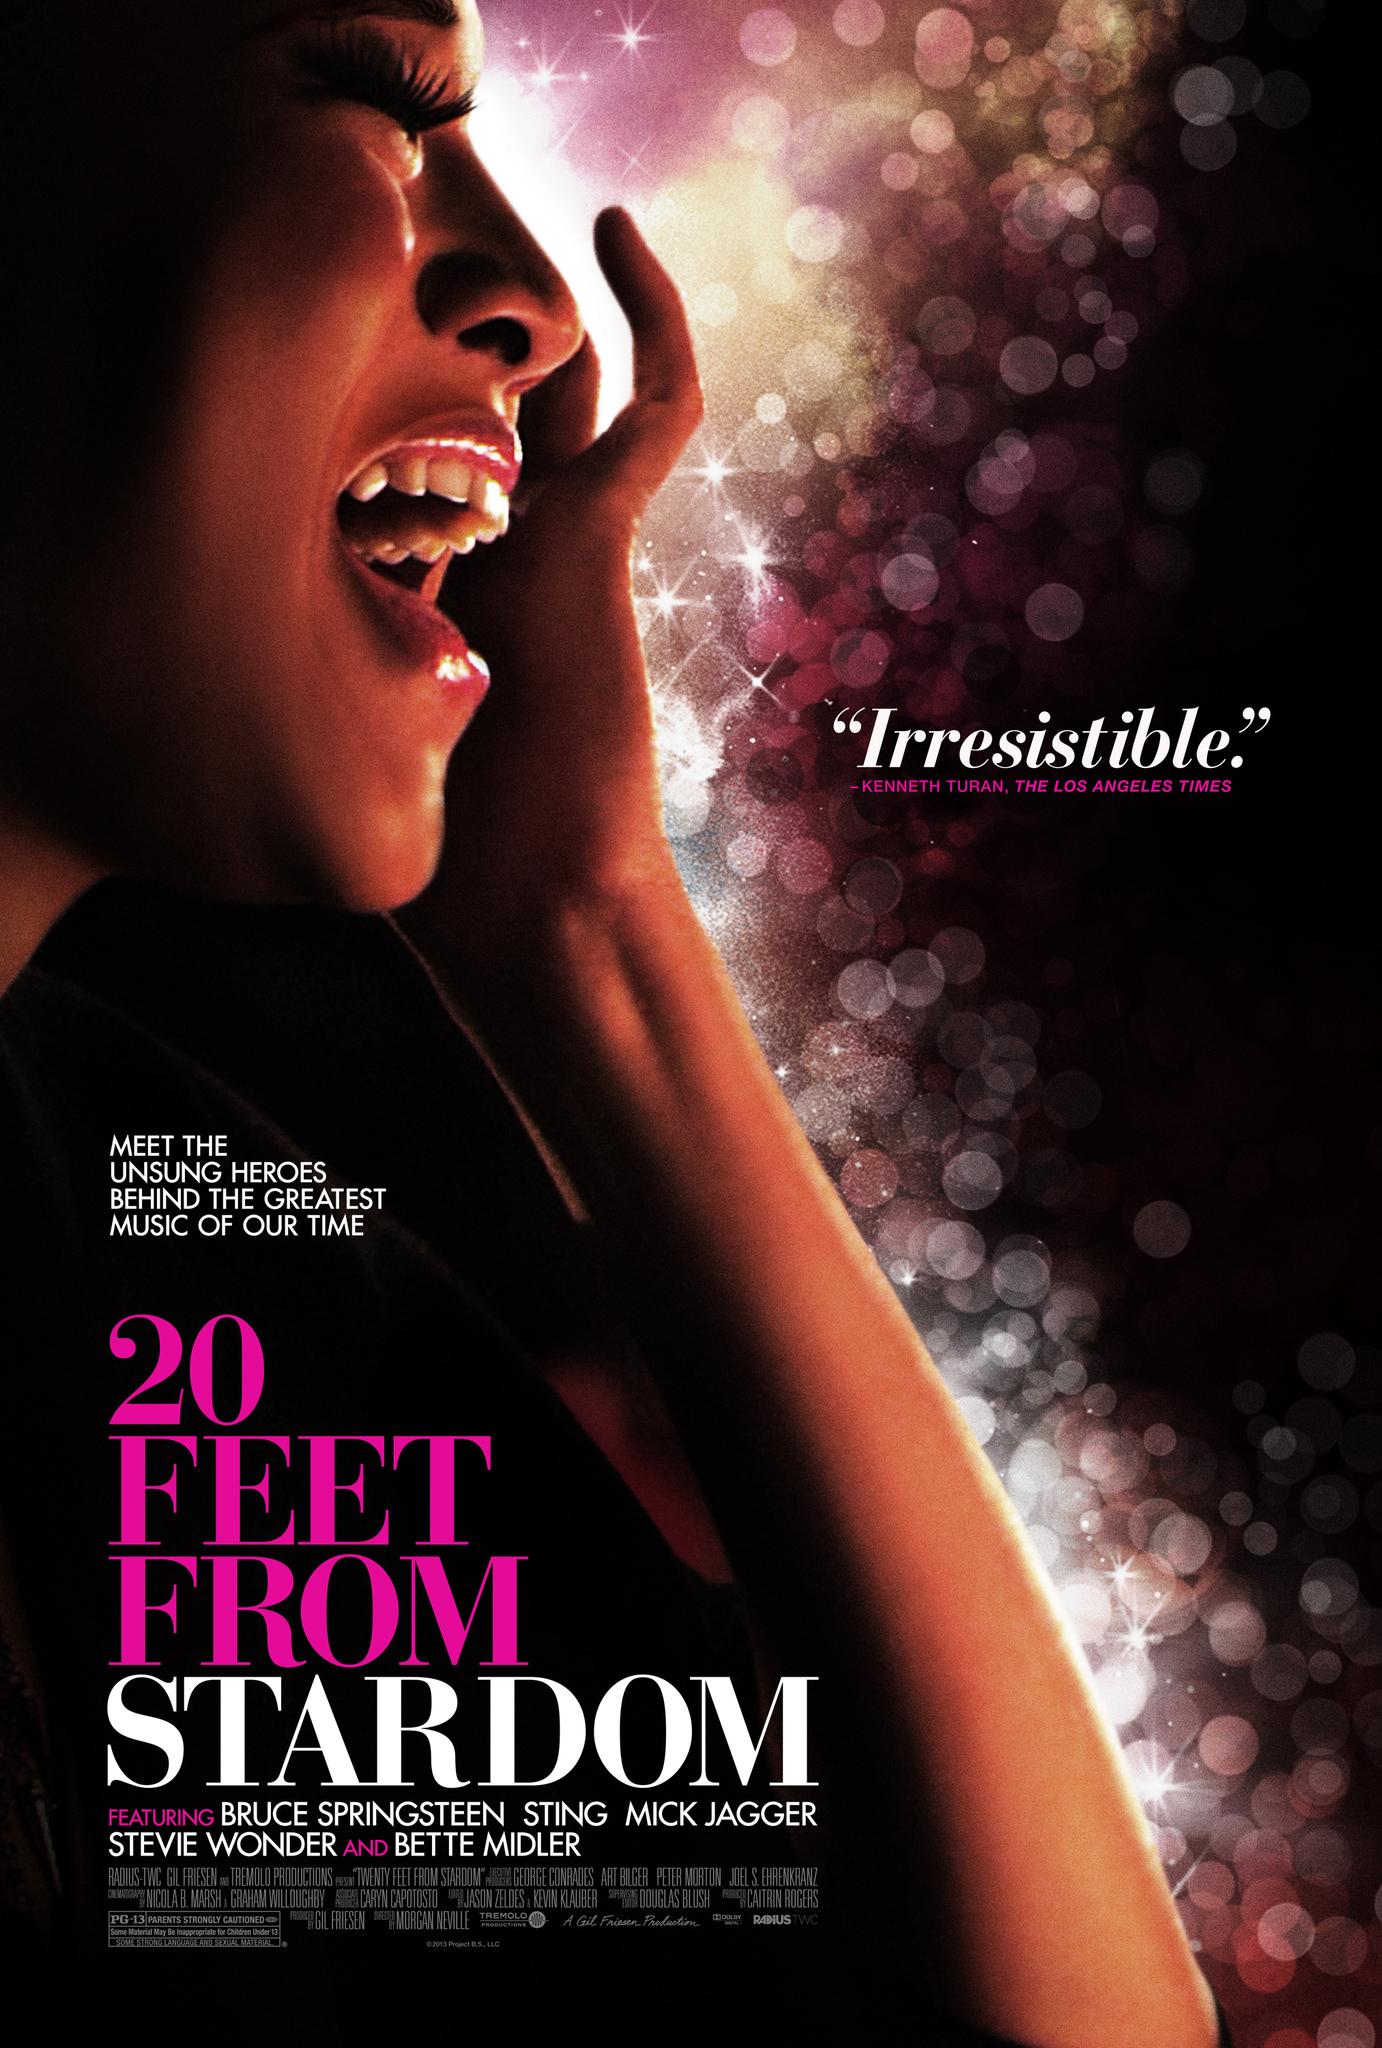 20 Feet From Stardom film cover art